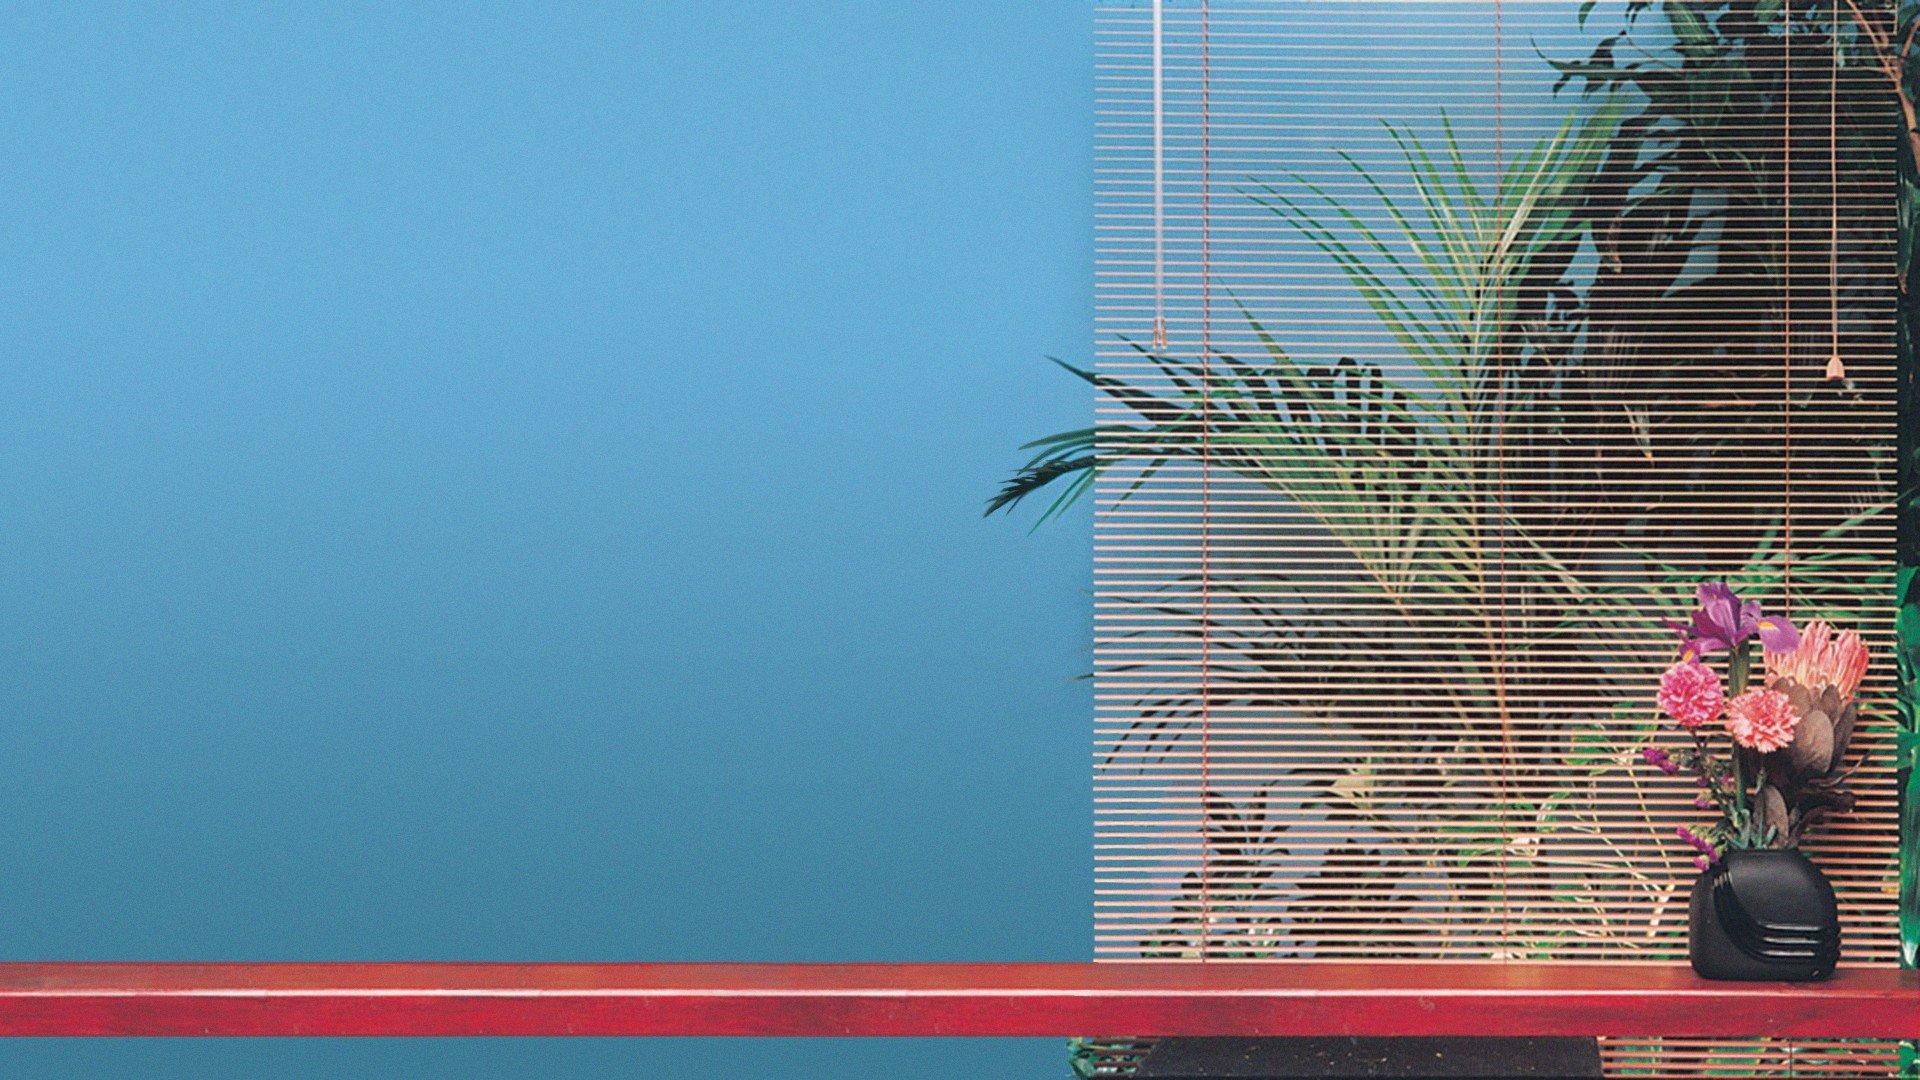 Hd Vaporwave Wallpaper Photo Desktop Backgrounds Hd Aesthetic 25180 Hd Wallpaper Backgrounds Download